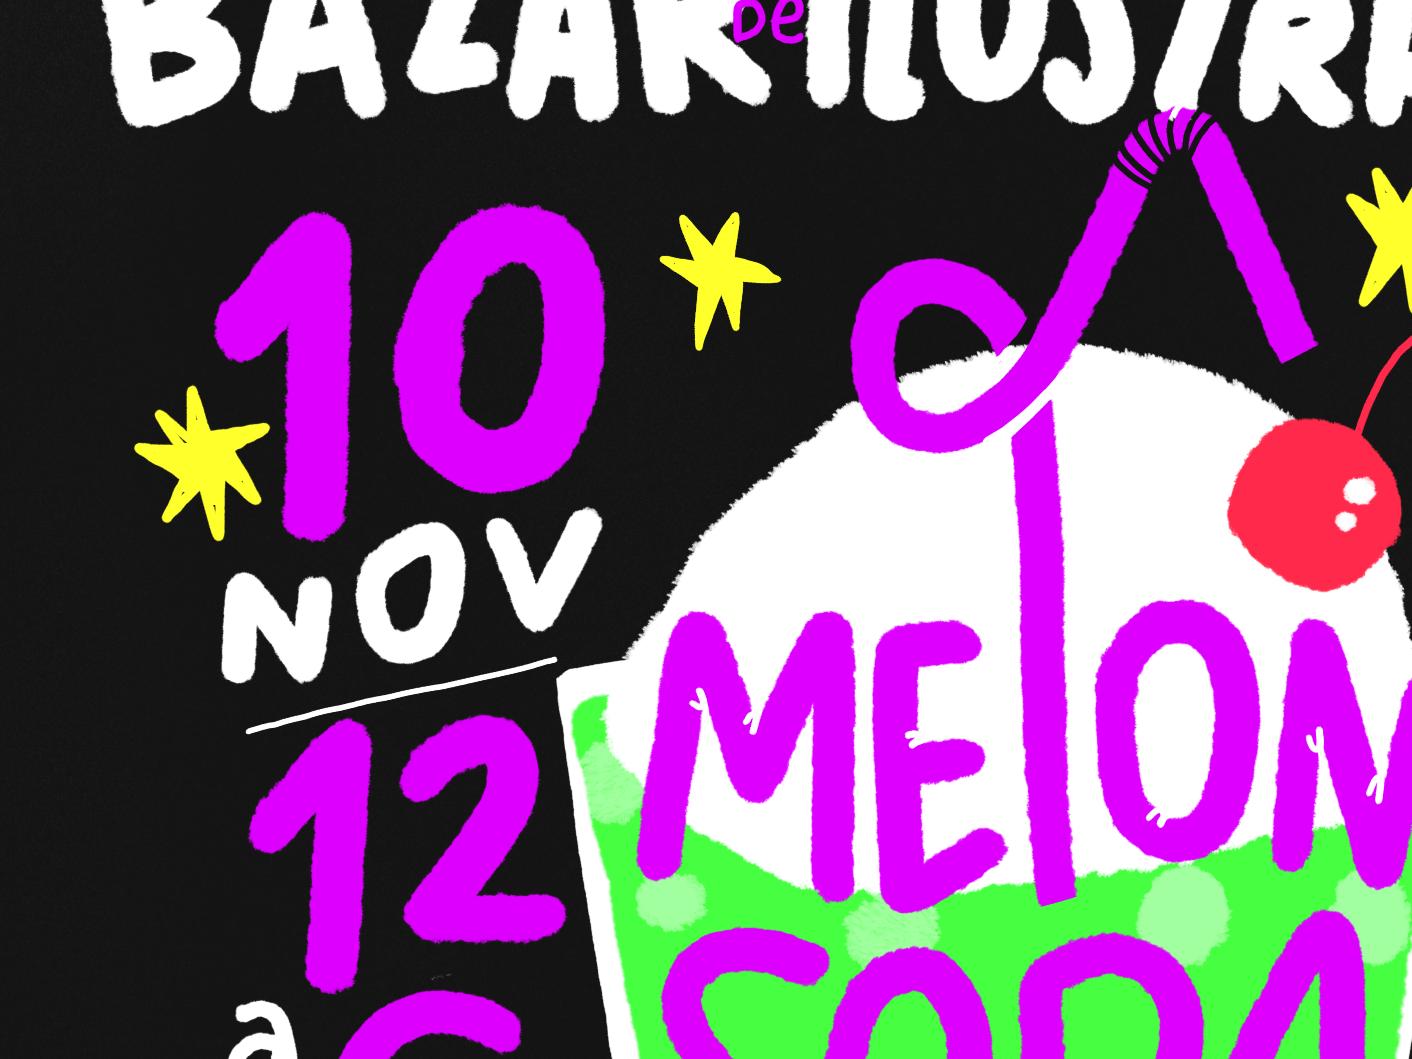 Soda Lettering procreate design texture illustration festival japan melon cartel add poster lettering soda